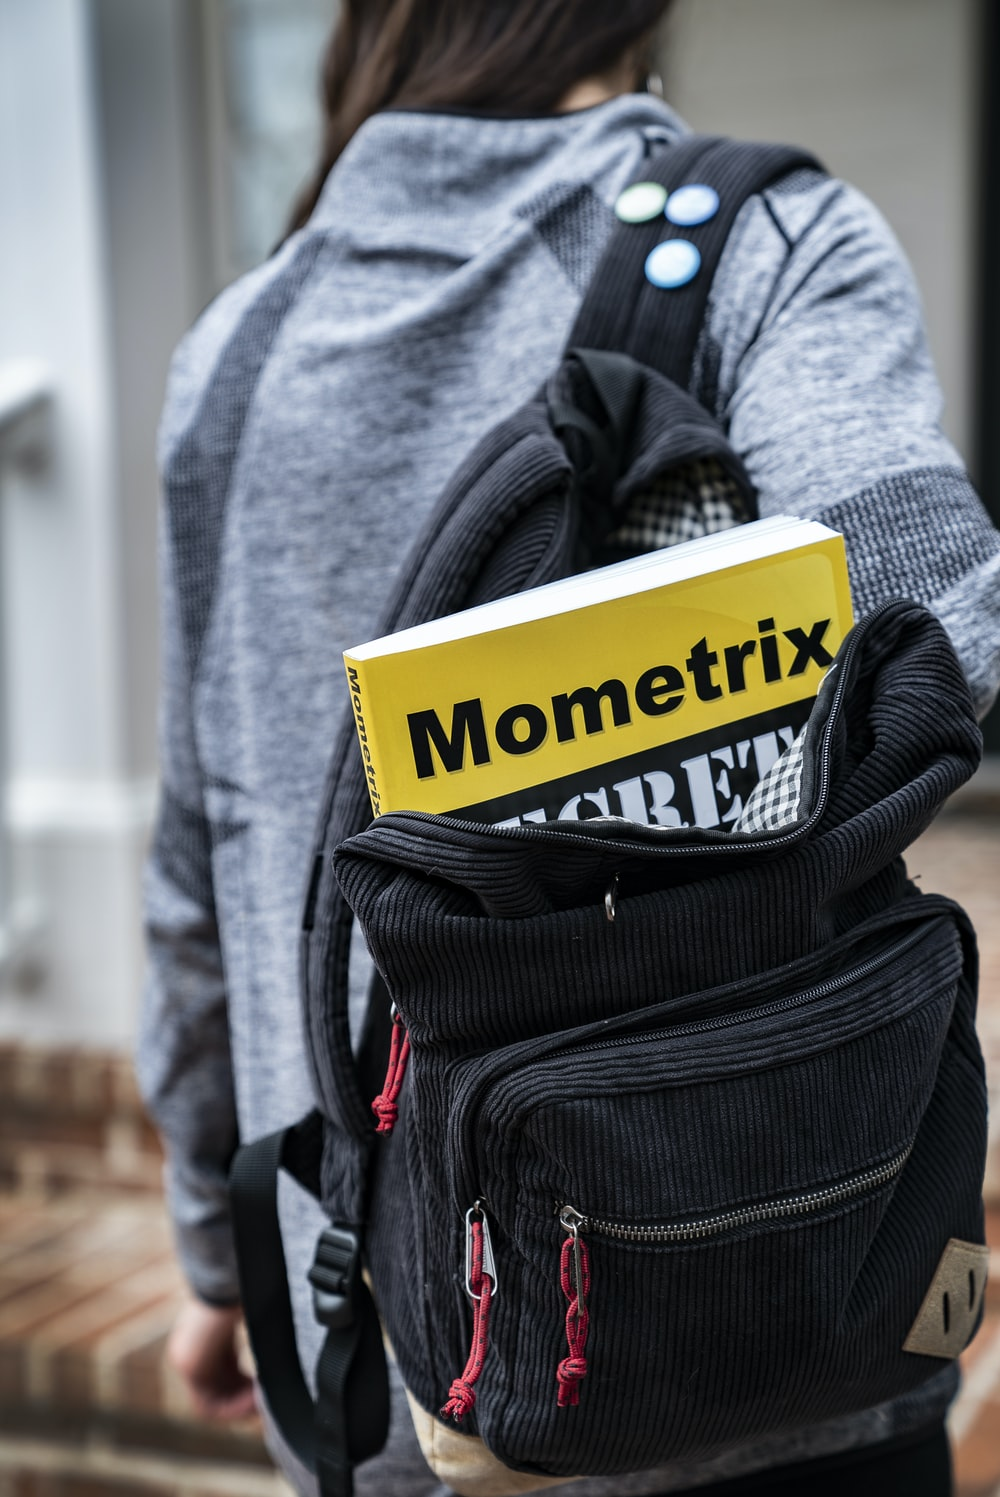 Mometrix book inside black backpack